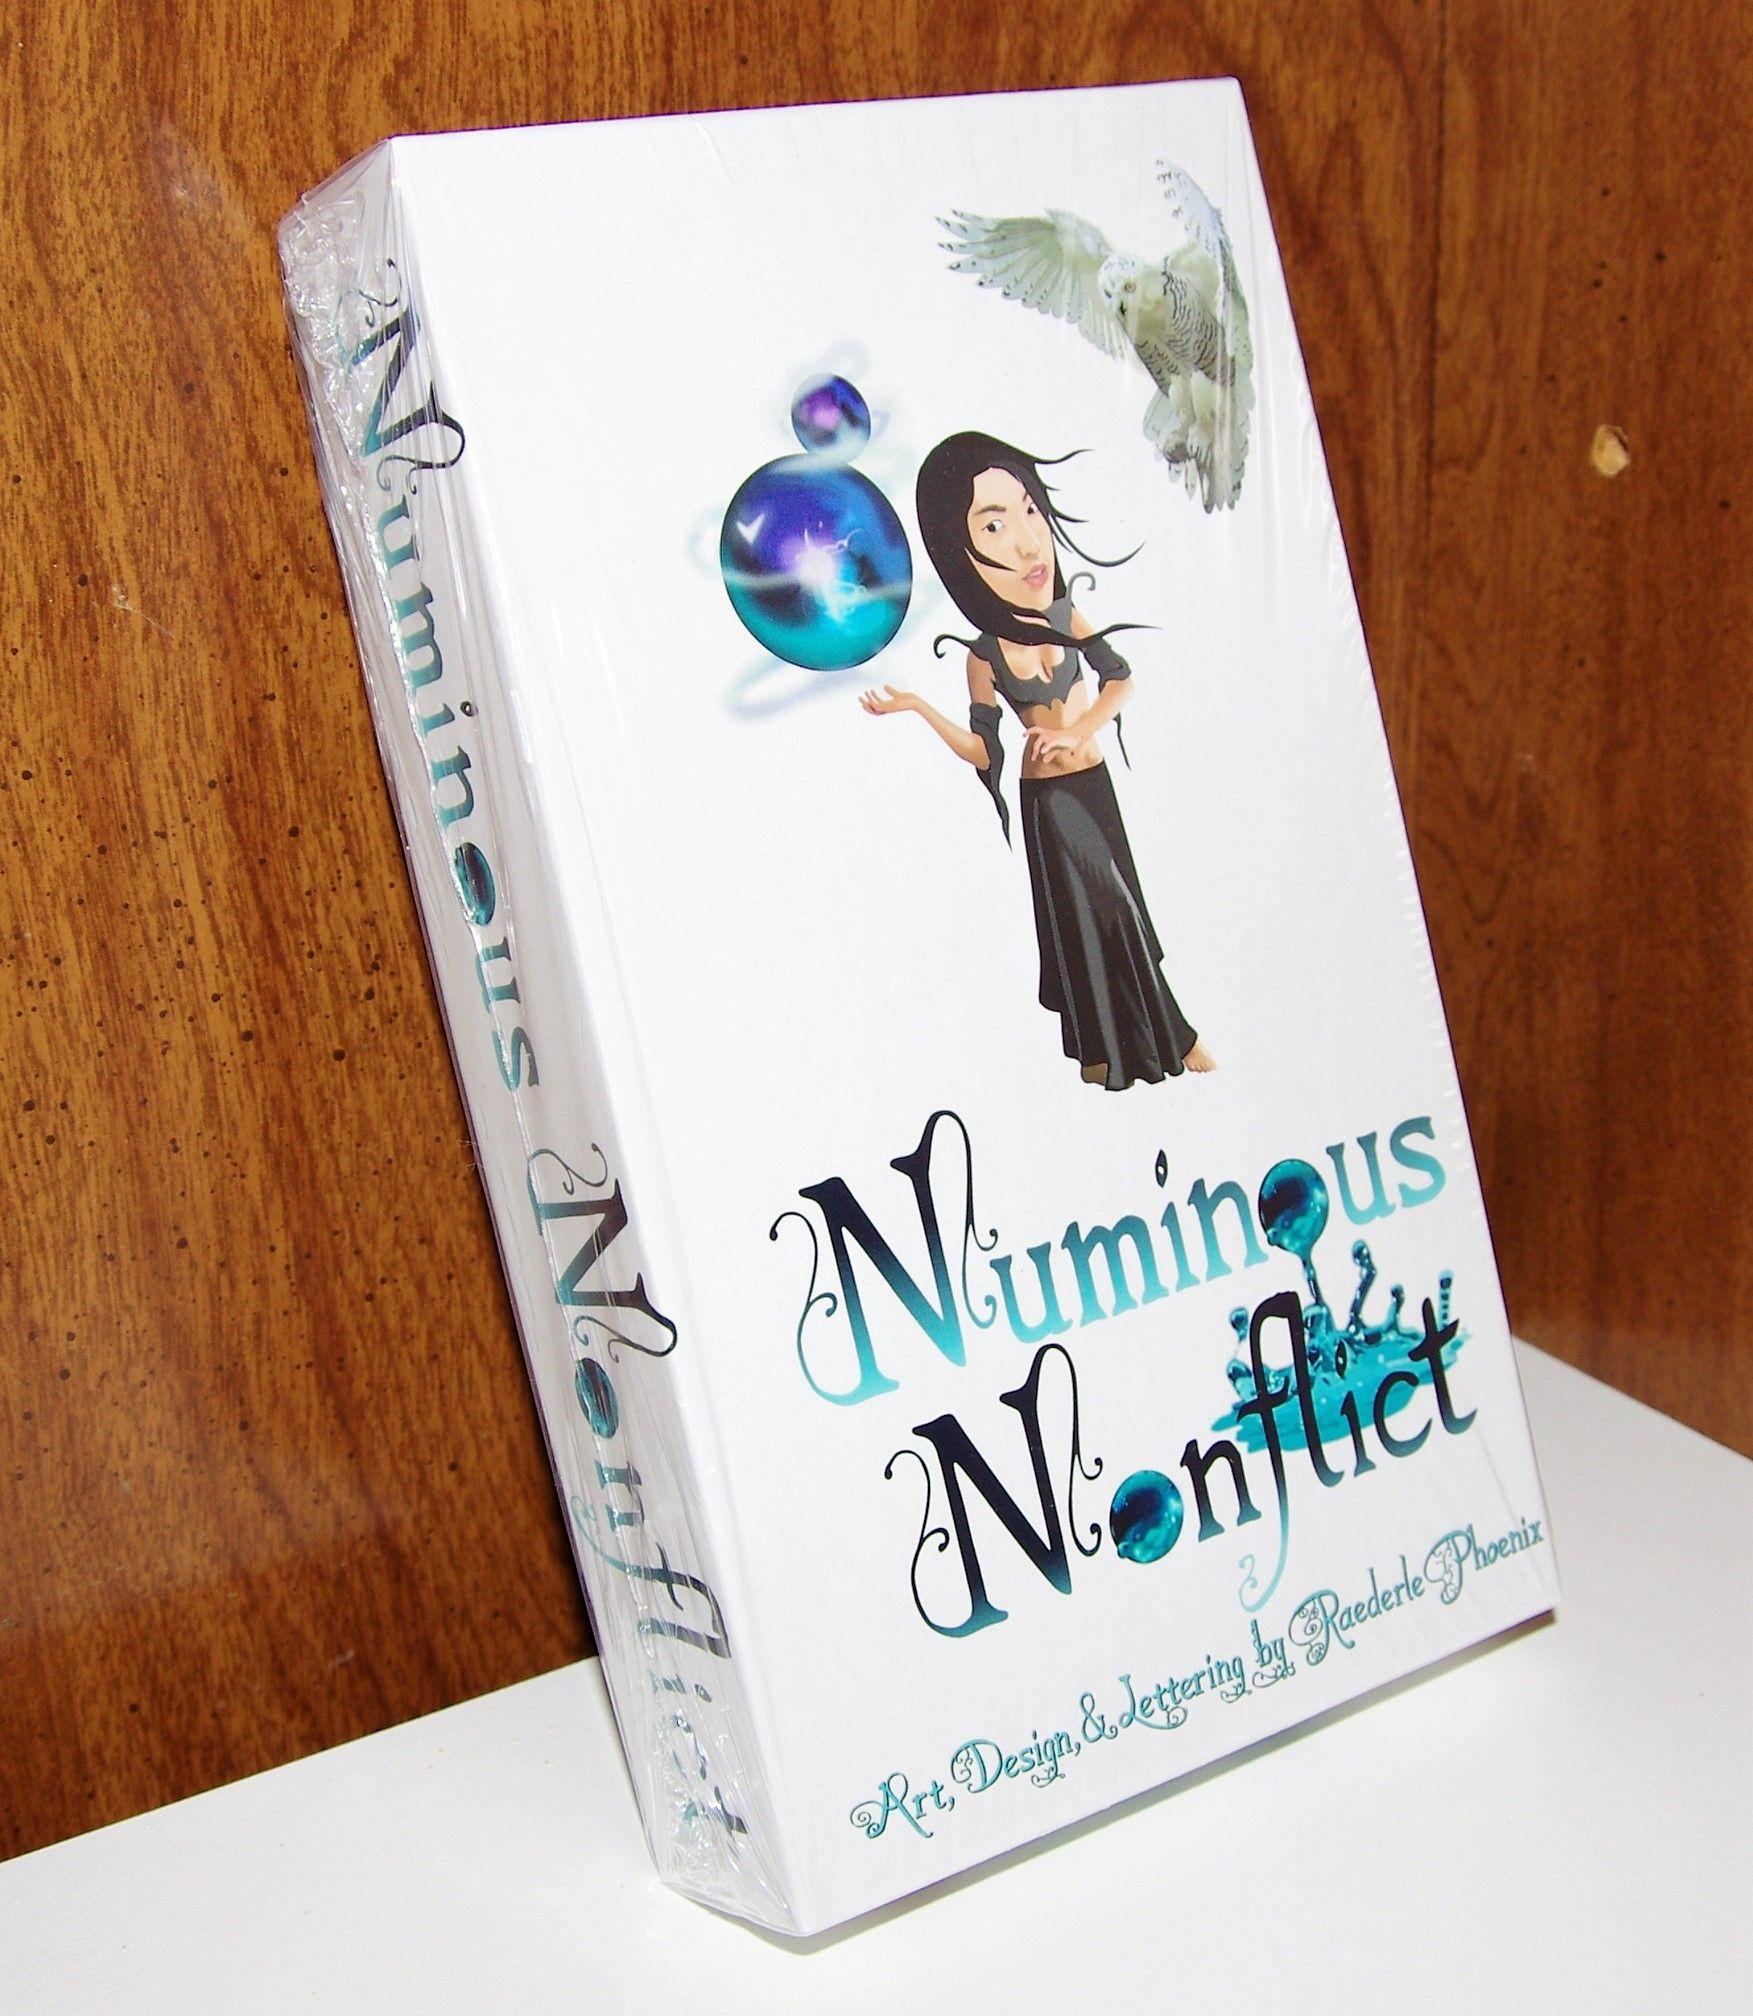 Numinous Nonflict